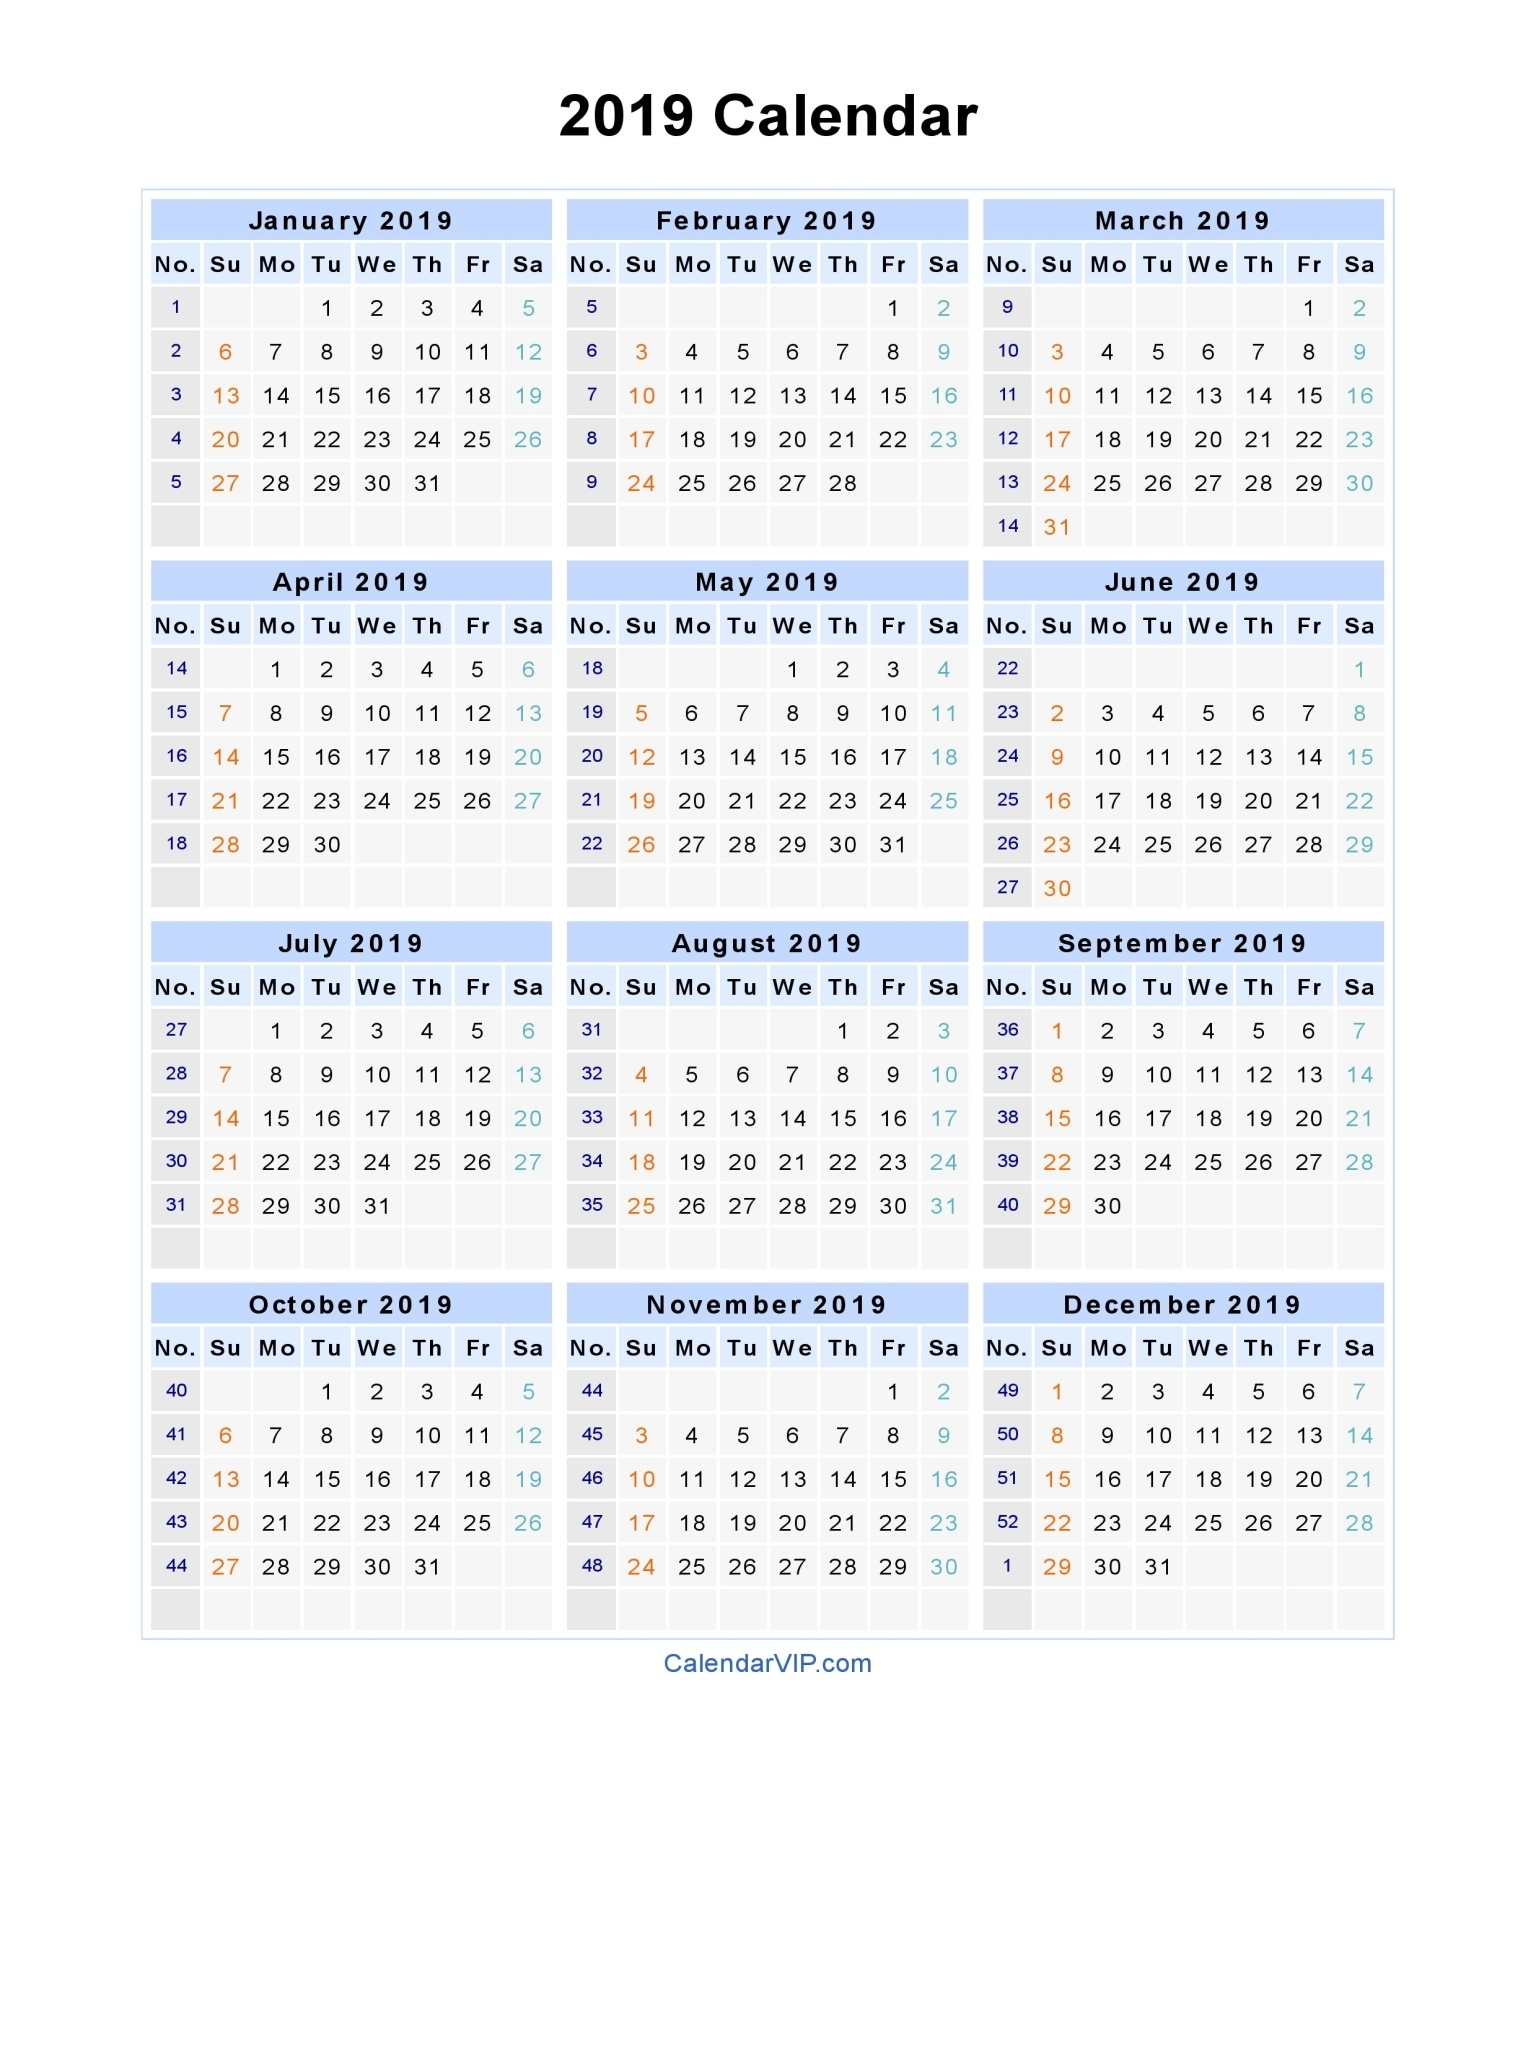 2019 Calendar - Blank Printable Calendar Template In Pdf Word Excel_A3 Landscape Calendar Printing